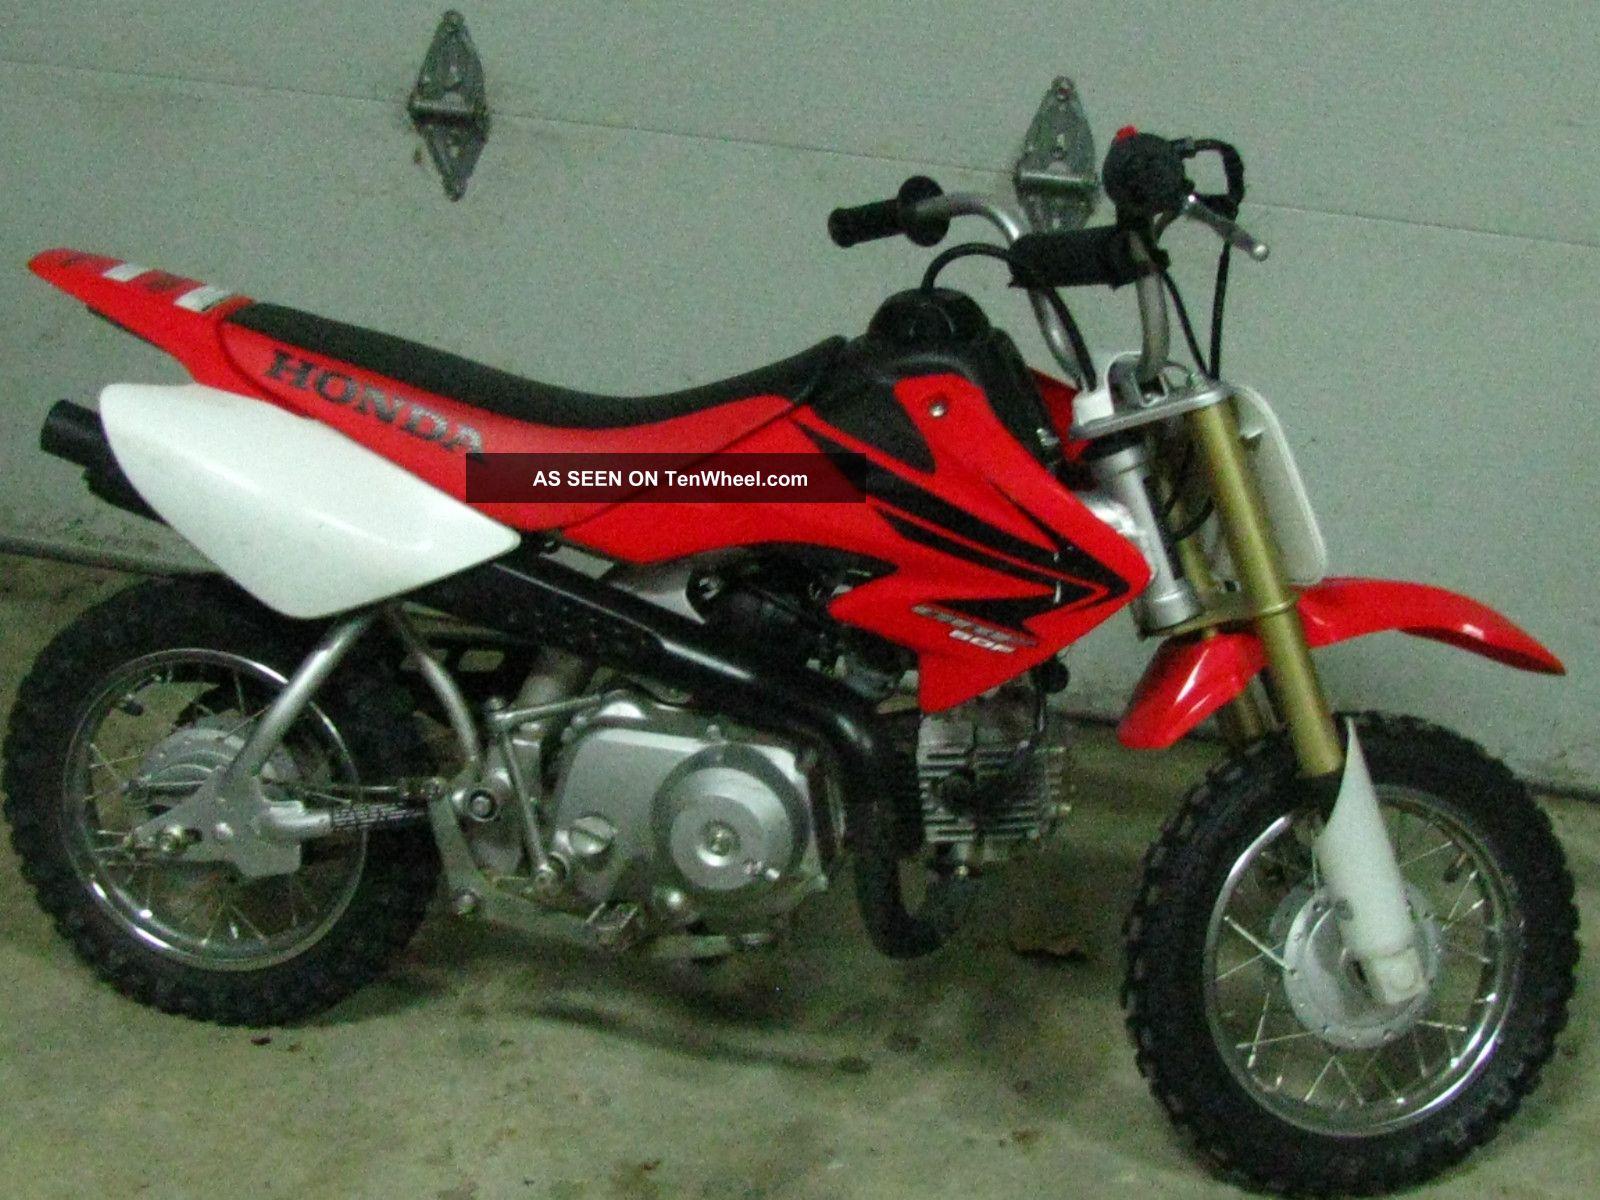 2007 Honda Crf® 50f Dirt Bike CRF photo